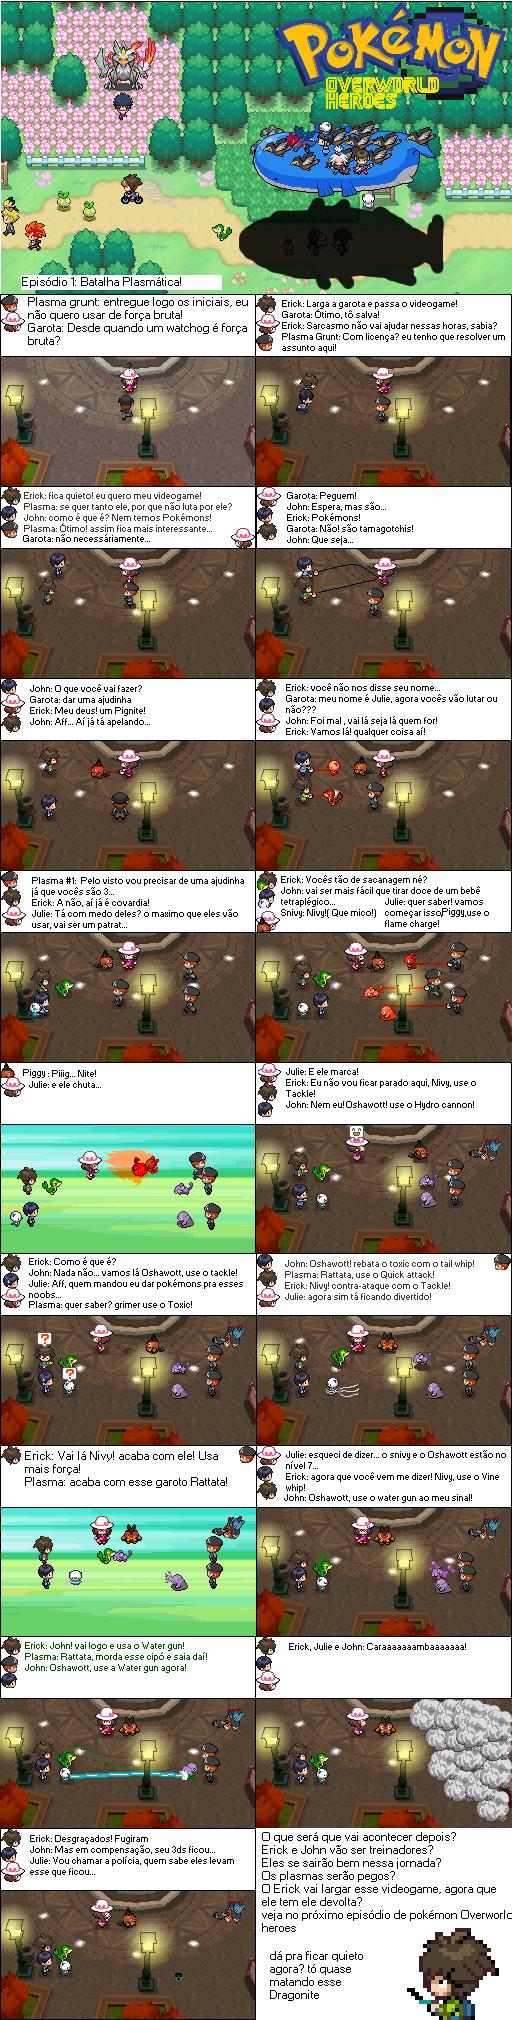 Pokemon Overworld Heroes #1: A plasmatic Battle! by Erick8530